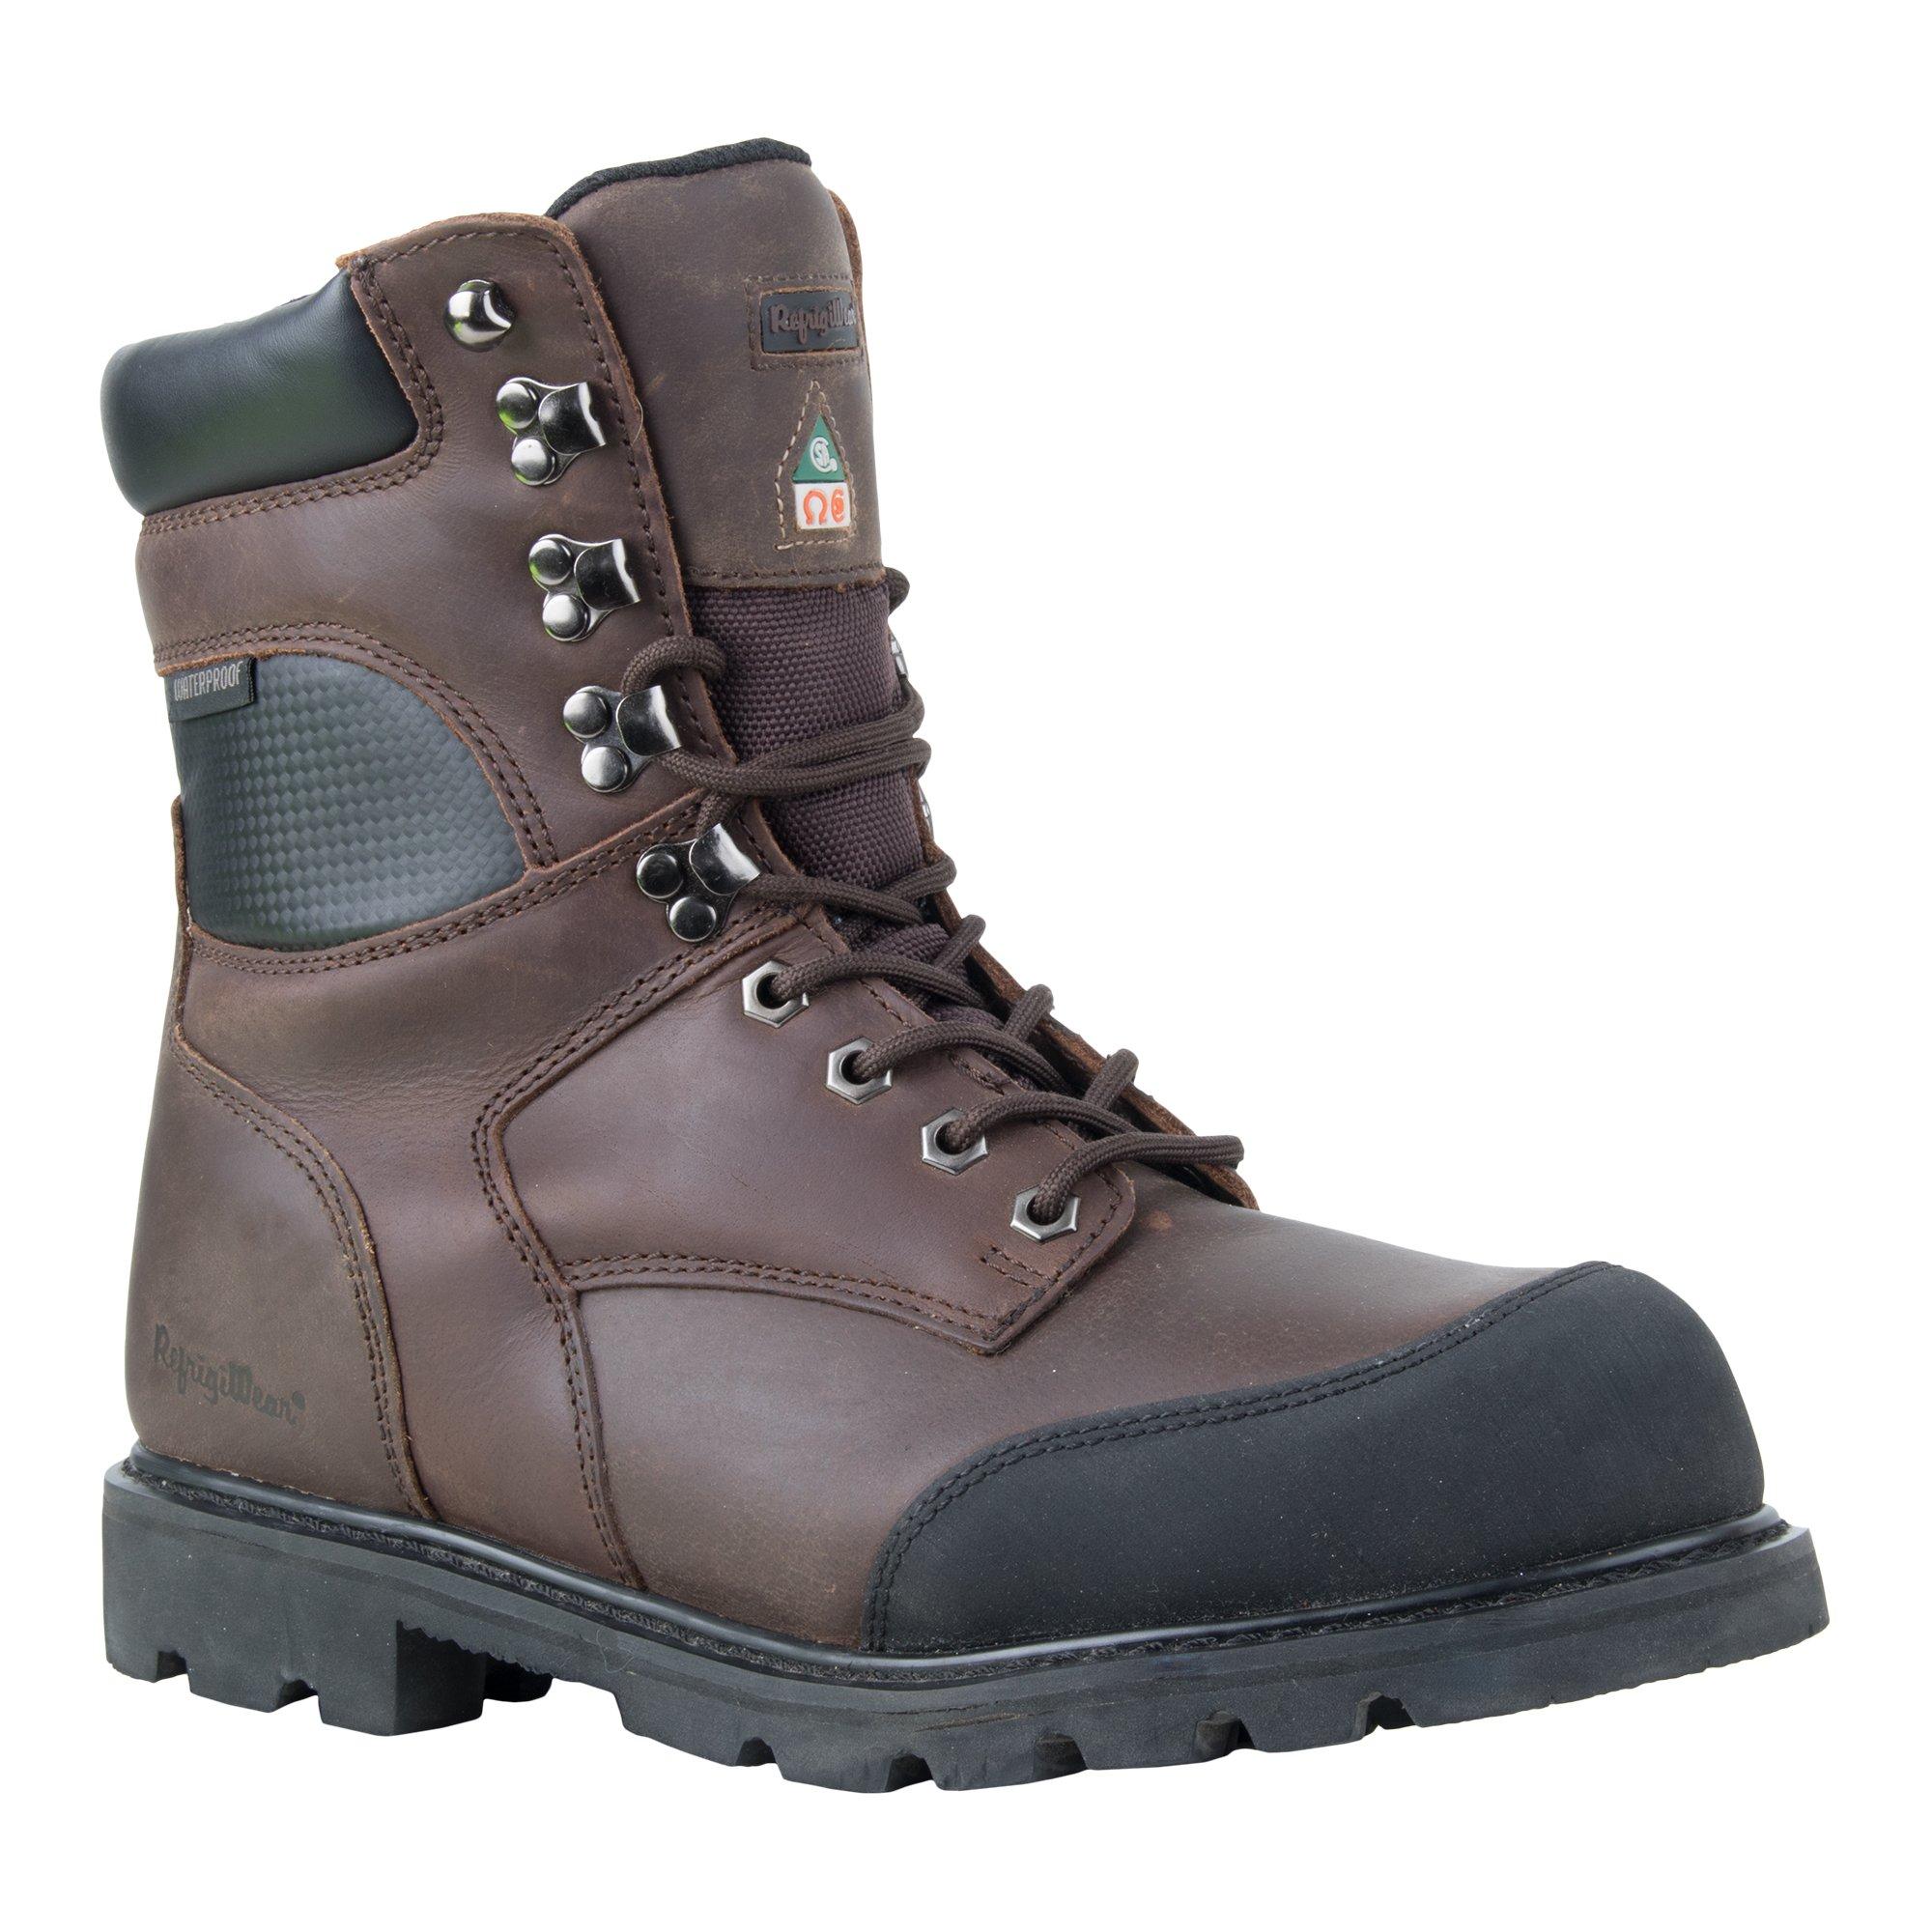 RefrigiWear Men's Platinum Leather Boot, Brown, 11.5 US by Refrigiwear